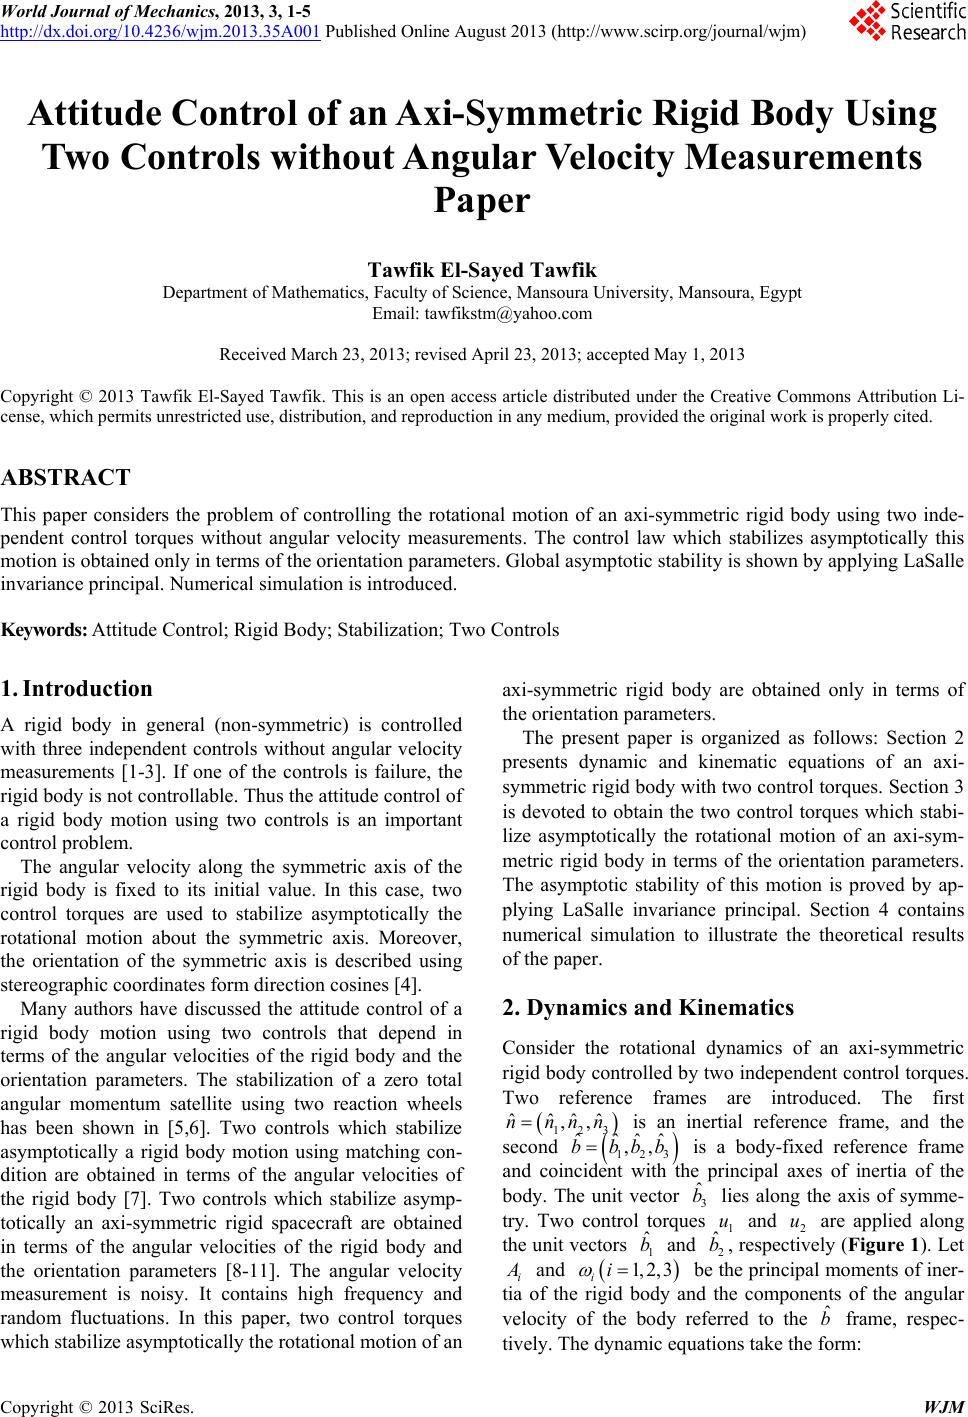 Popular Mechanics Subscription >> Attitude Control of an Axi-Symmetric Rigid Body Using Two Controls without Angular Velocity ...